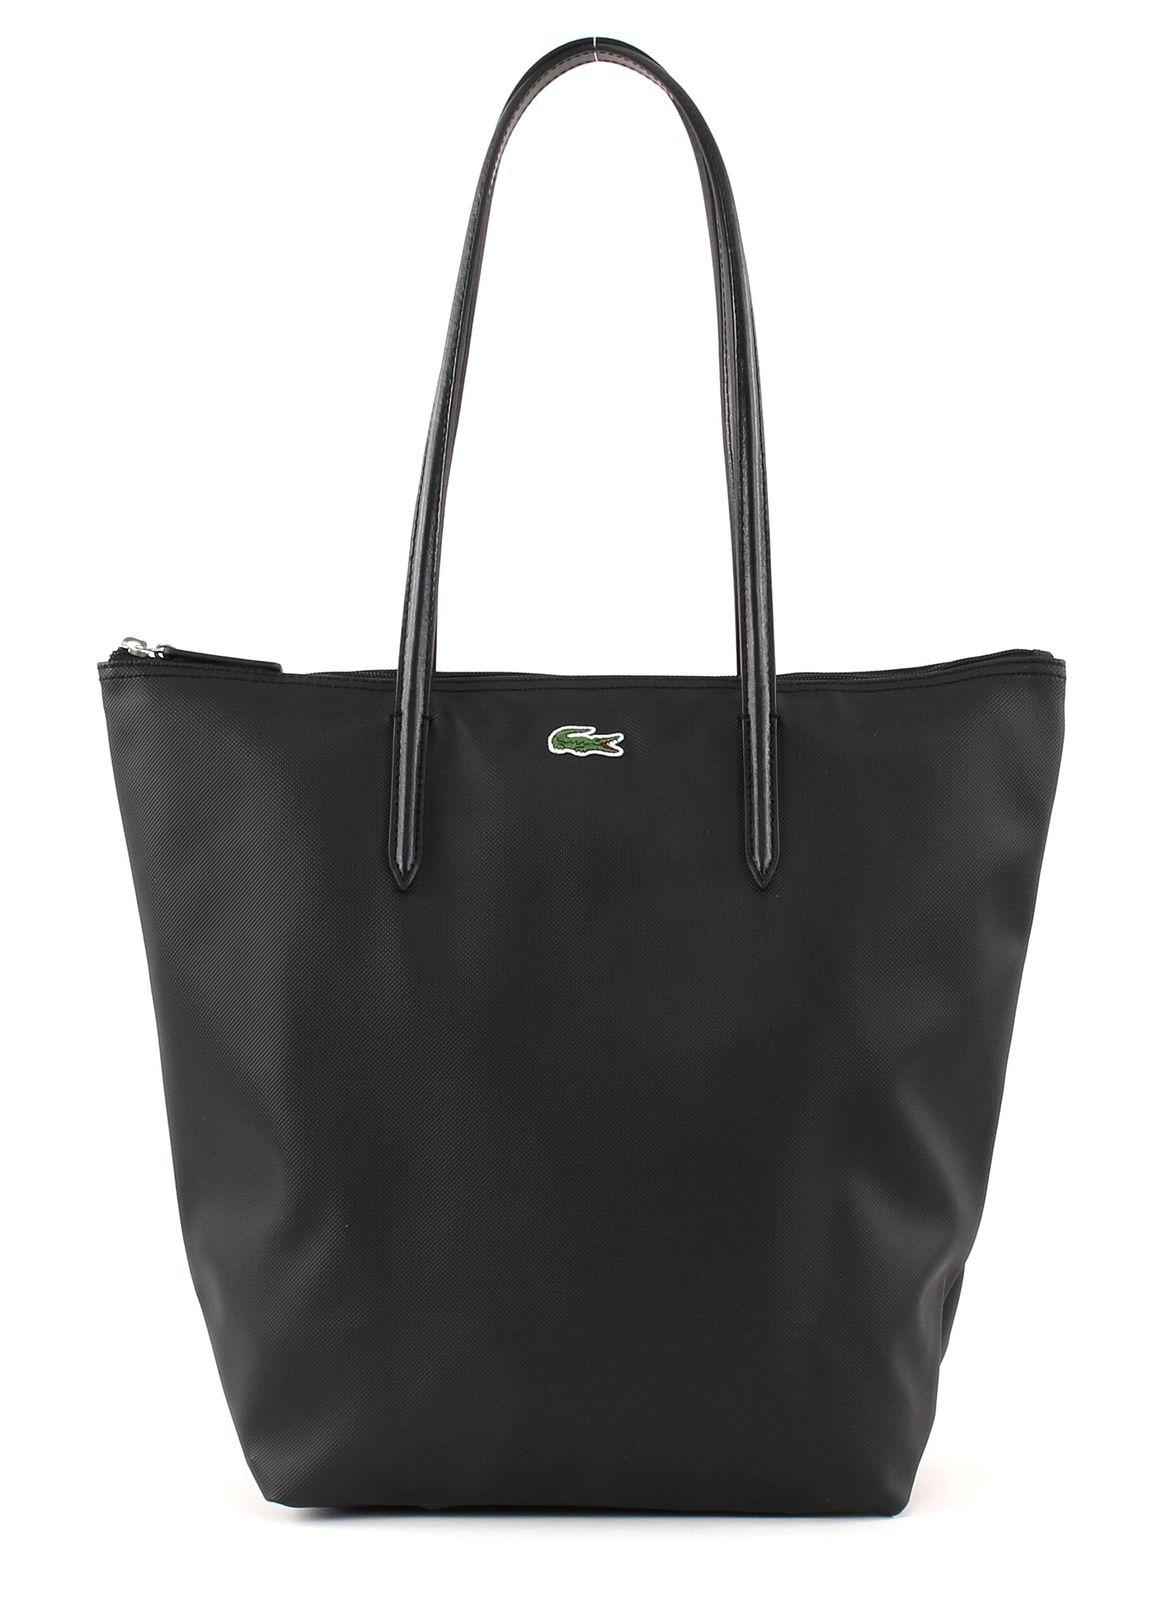 LACOSTE L.12.12 Concept Vertical Shopping Bag Black